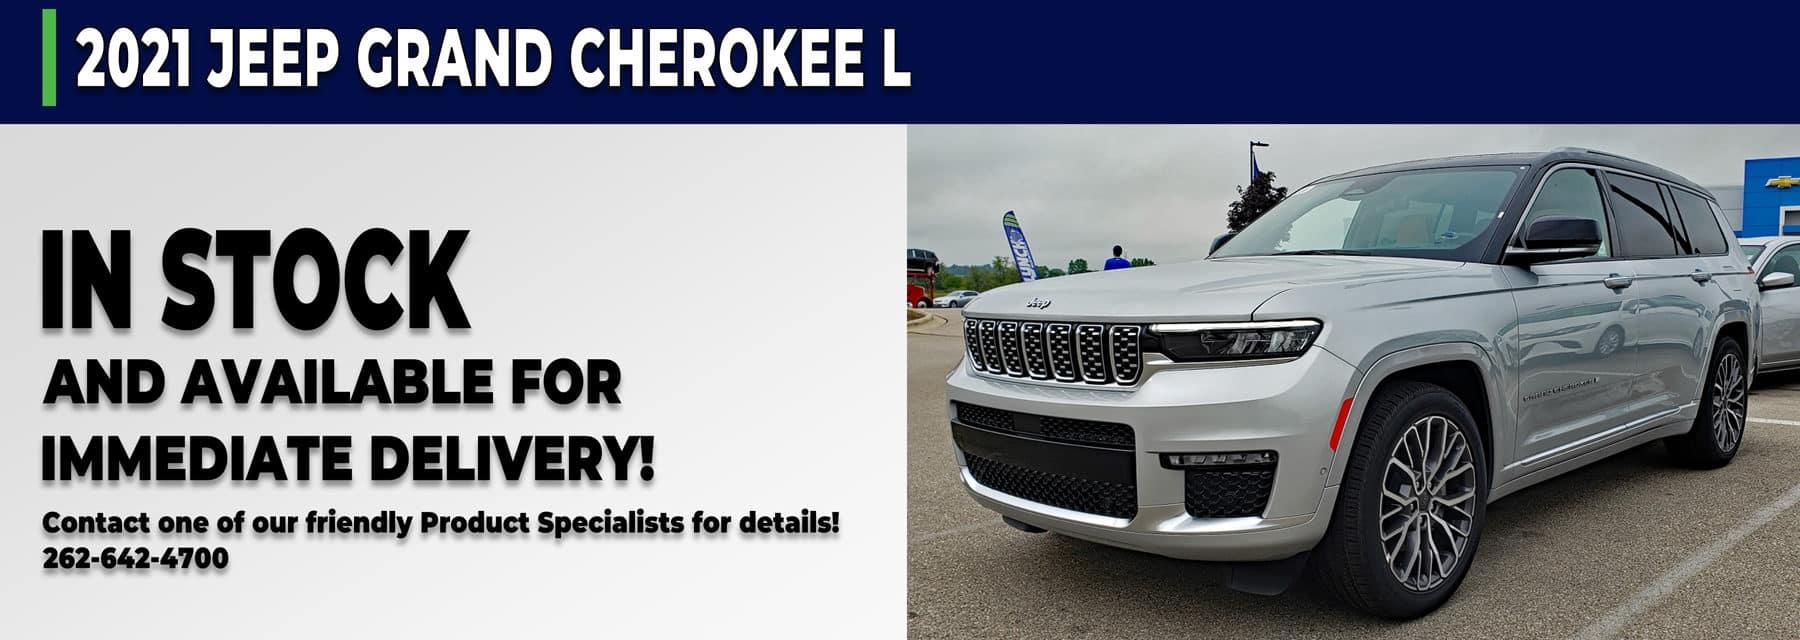 Grand Cherokee L in stock in Mukwonago Wisconsin